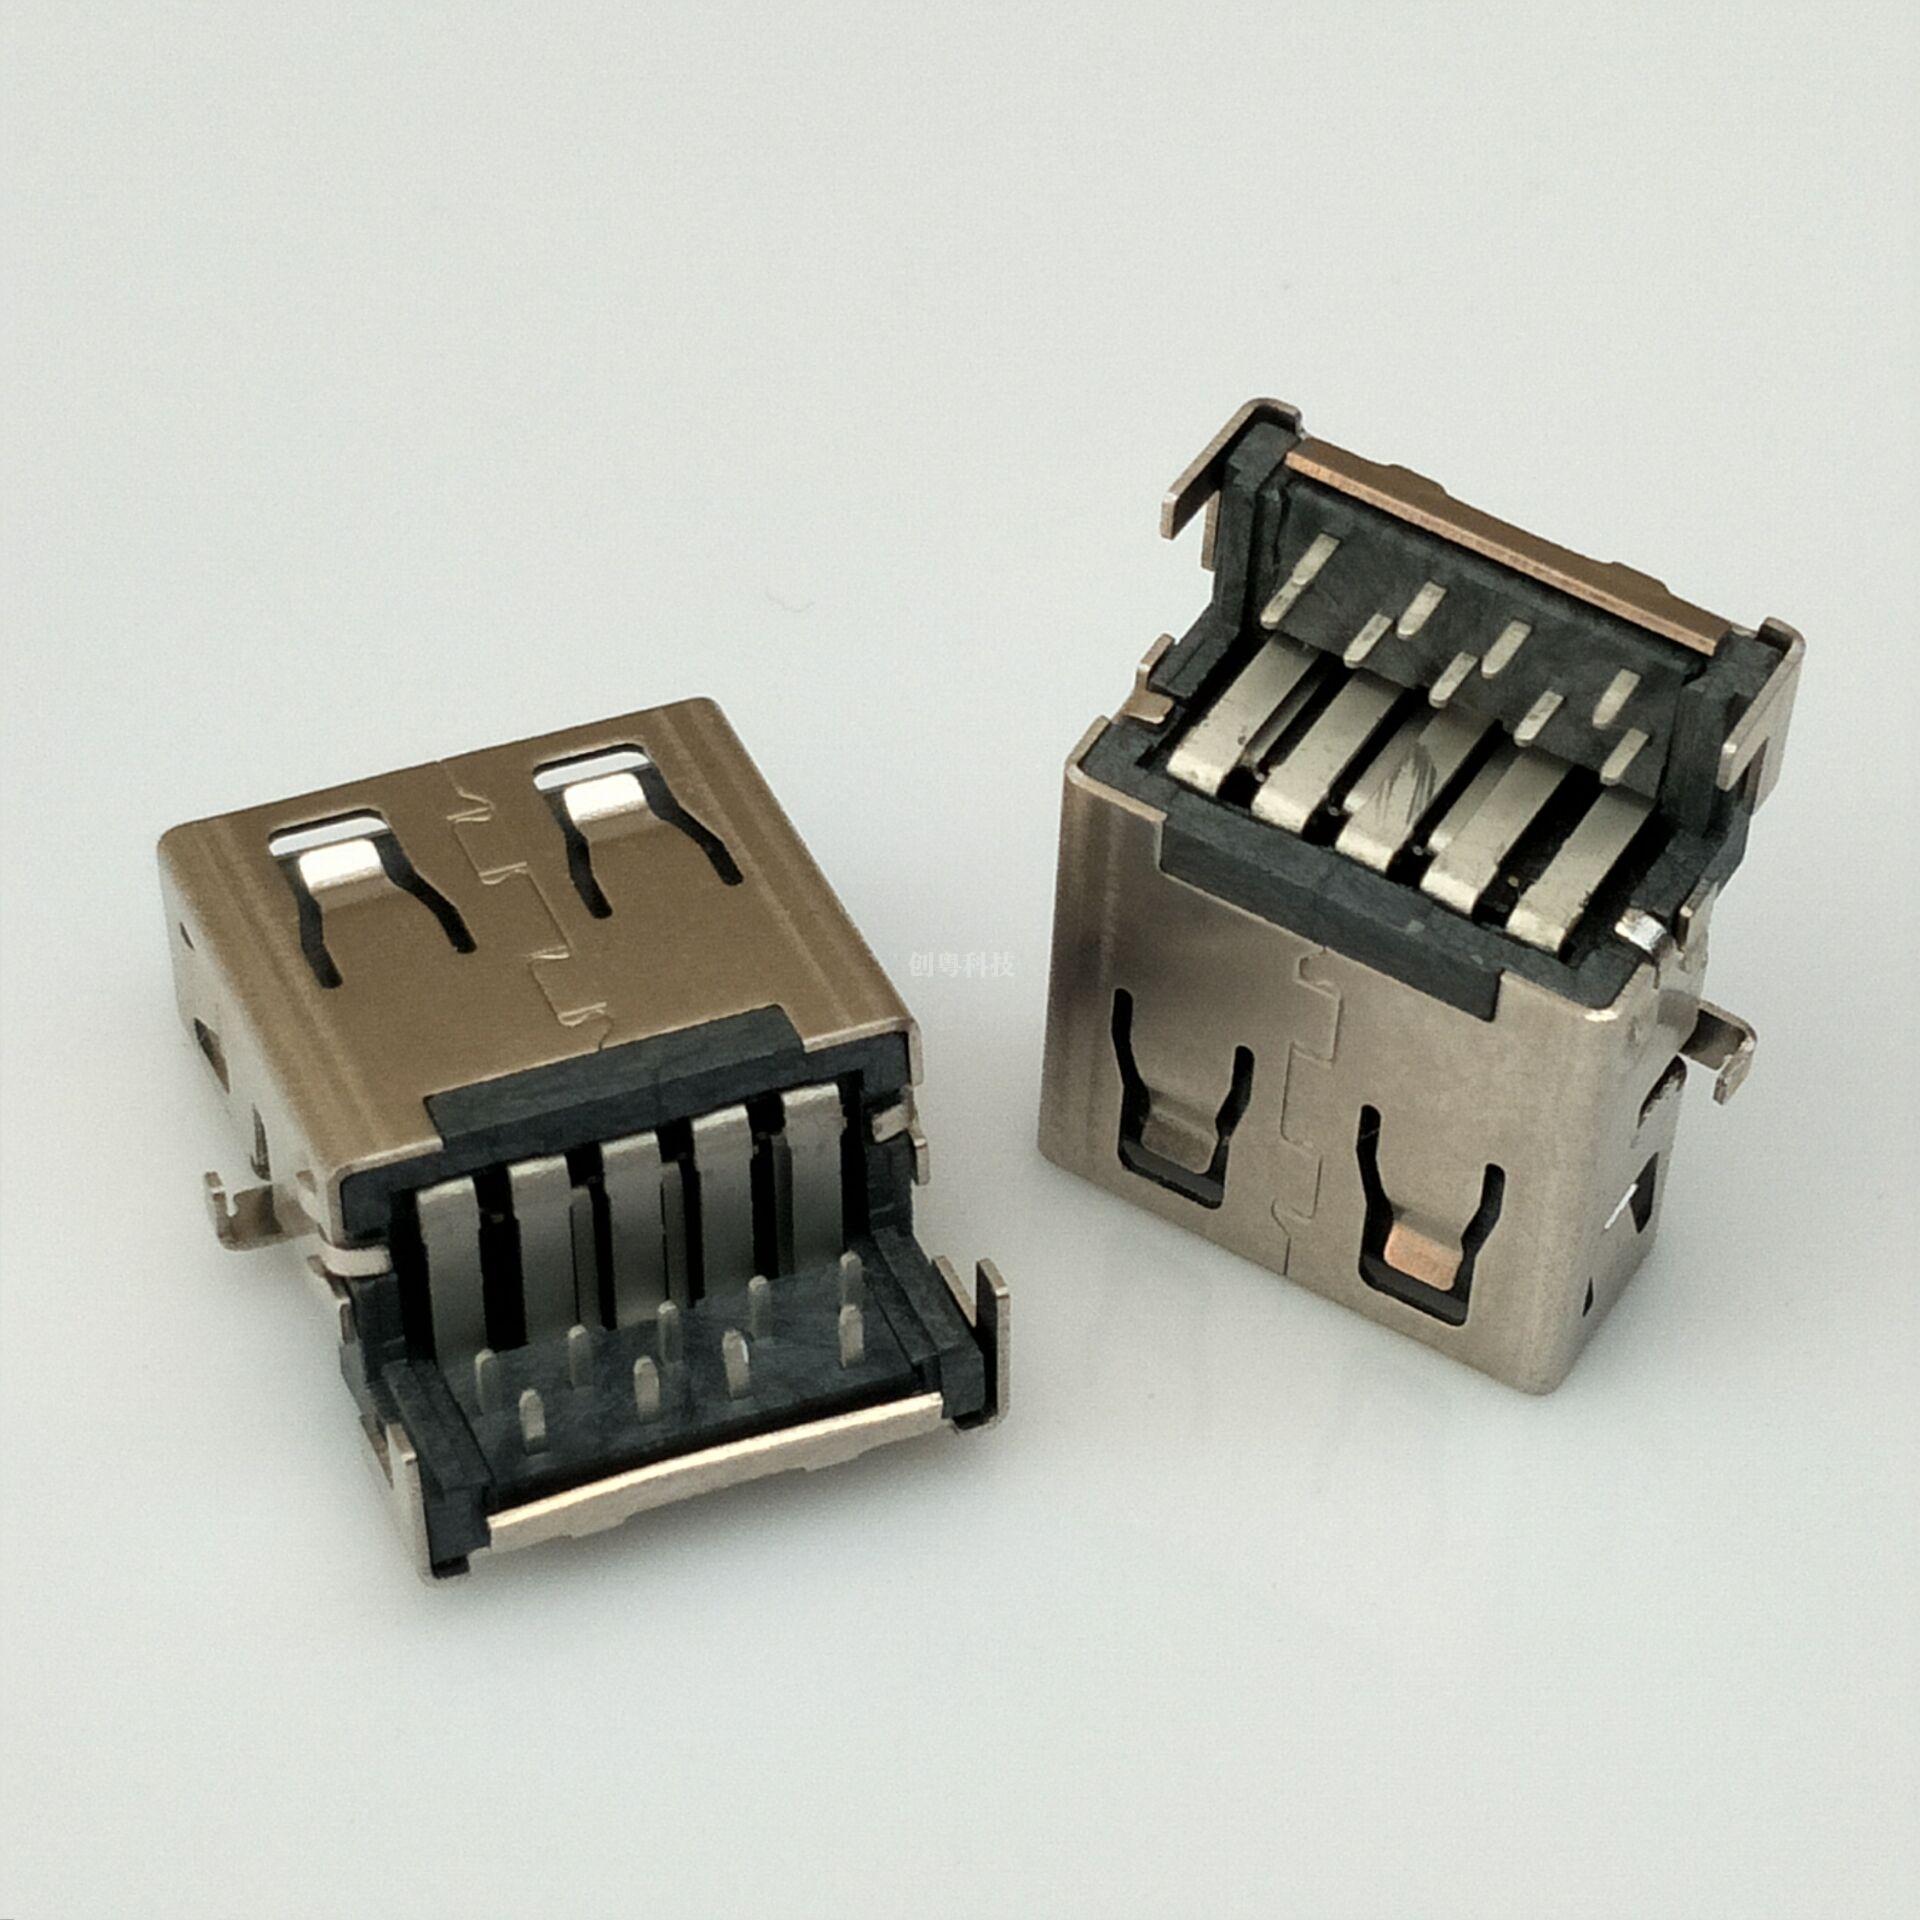 USB 3.0 超薄沉板